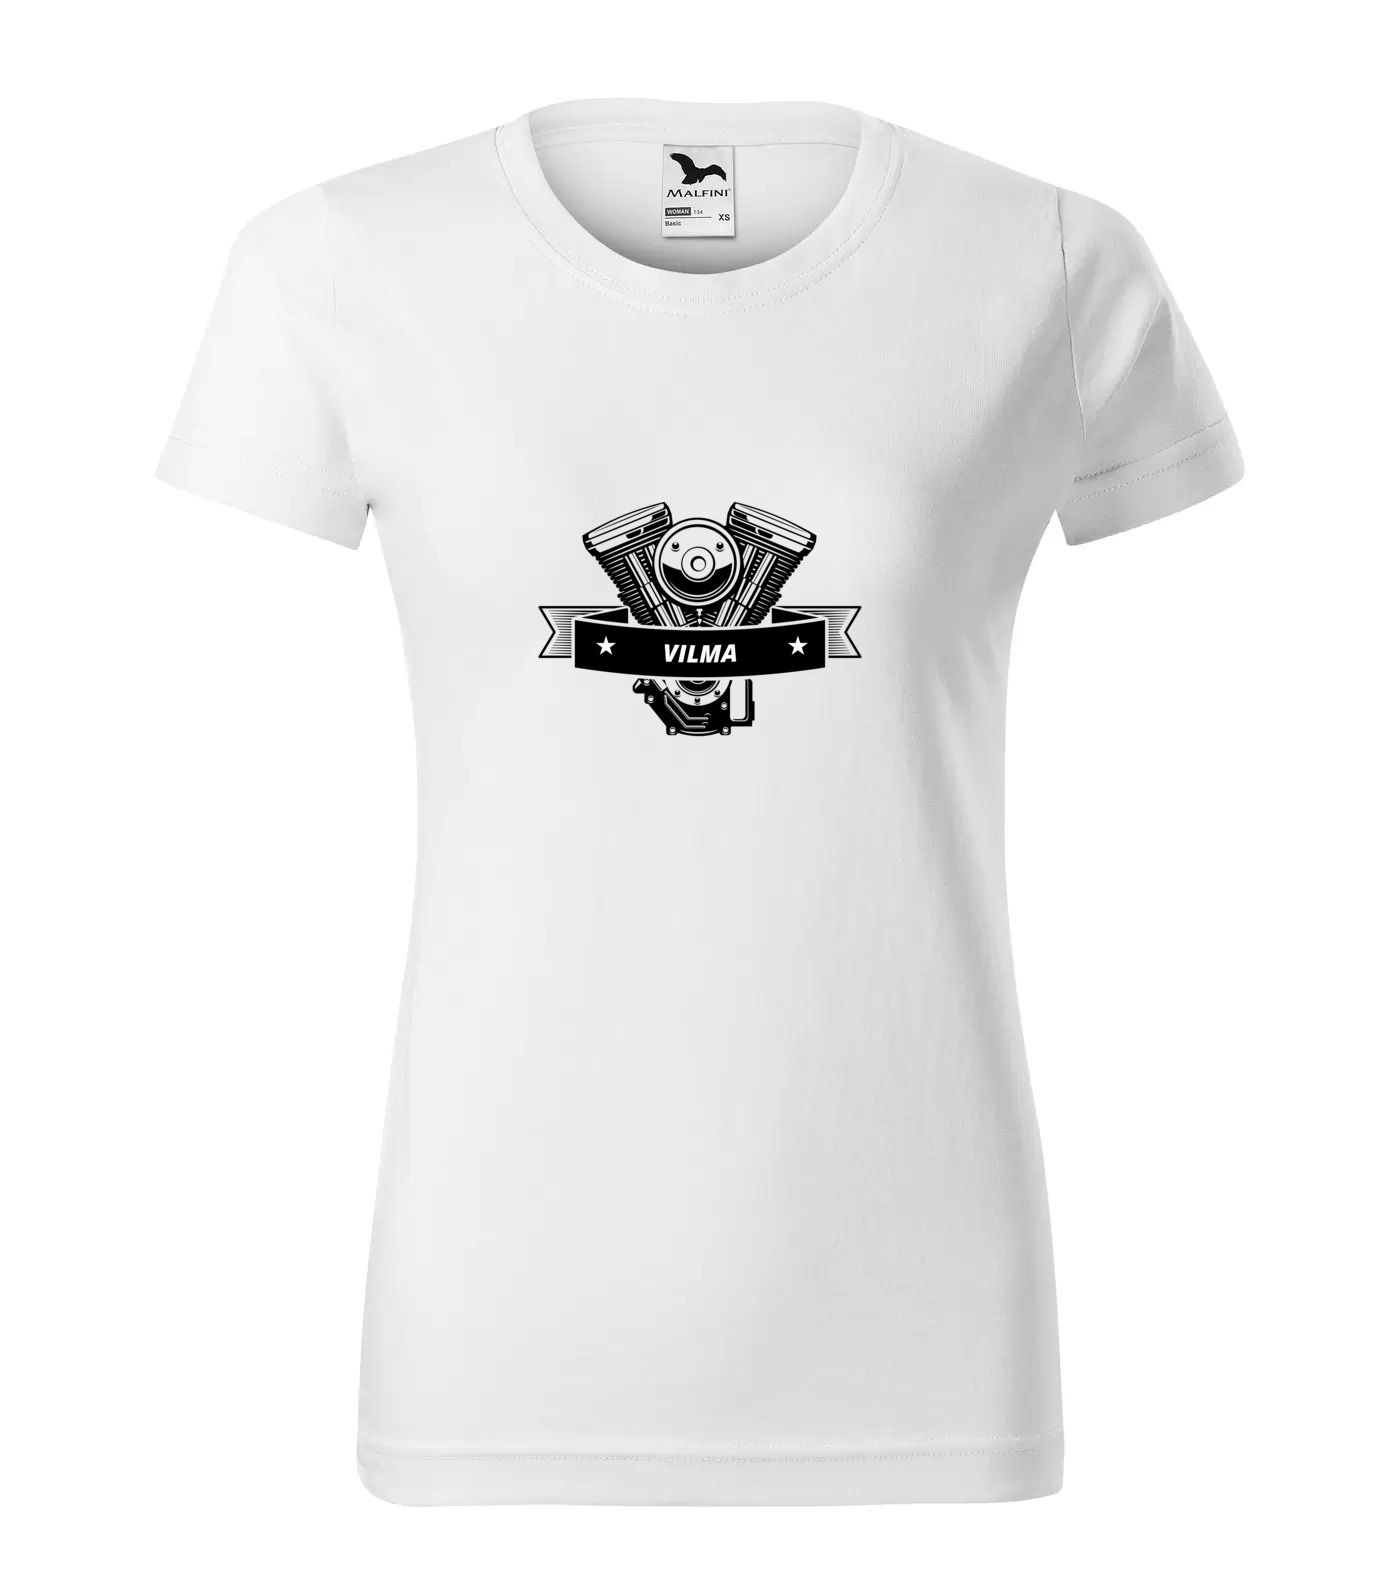 Tričko Motorkářka Vilma